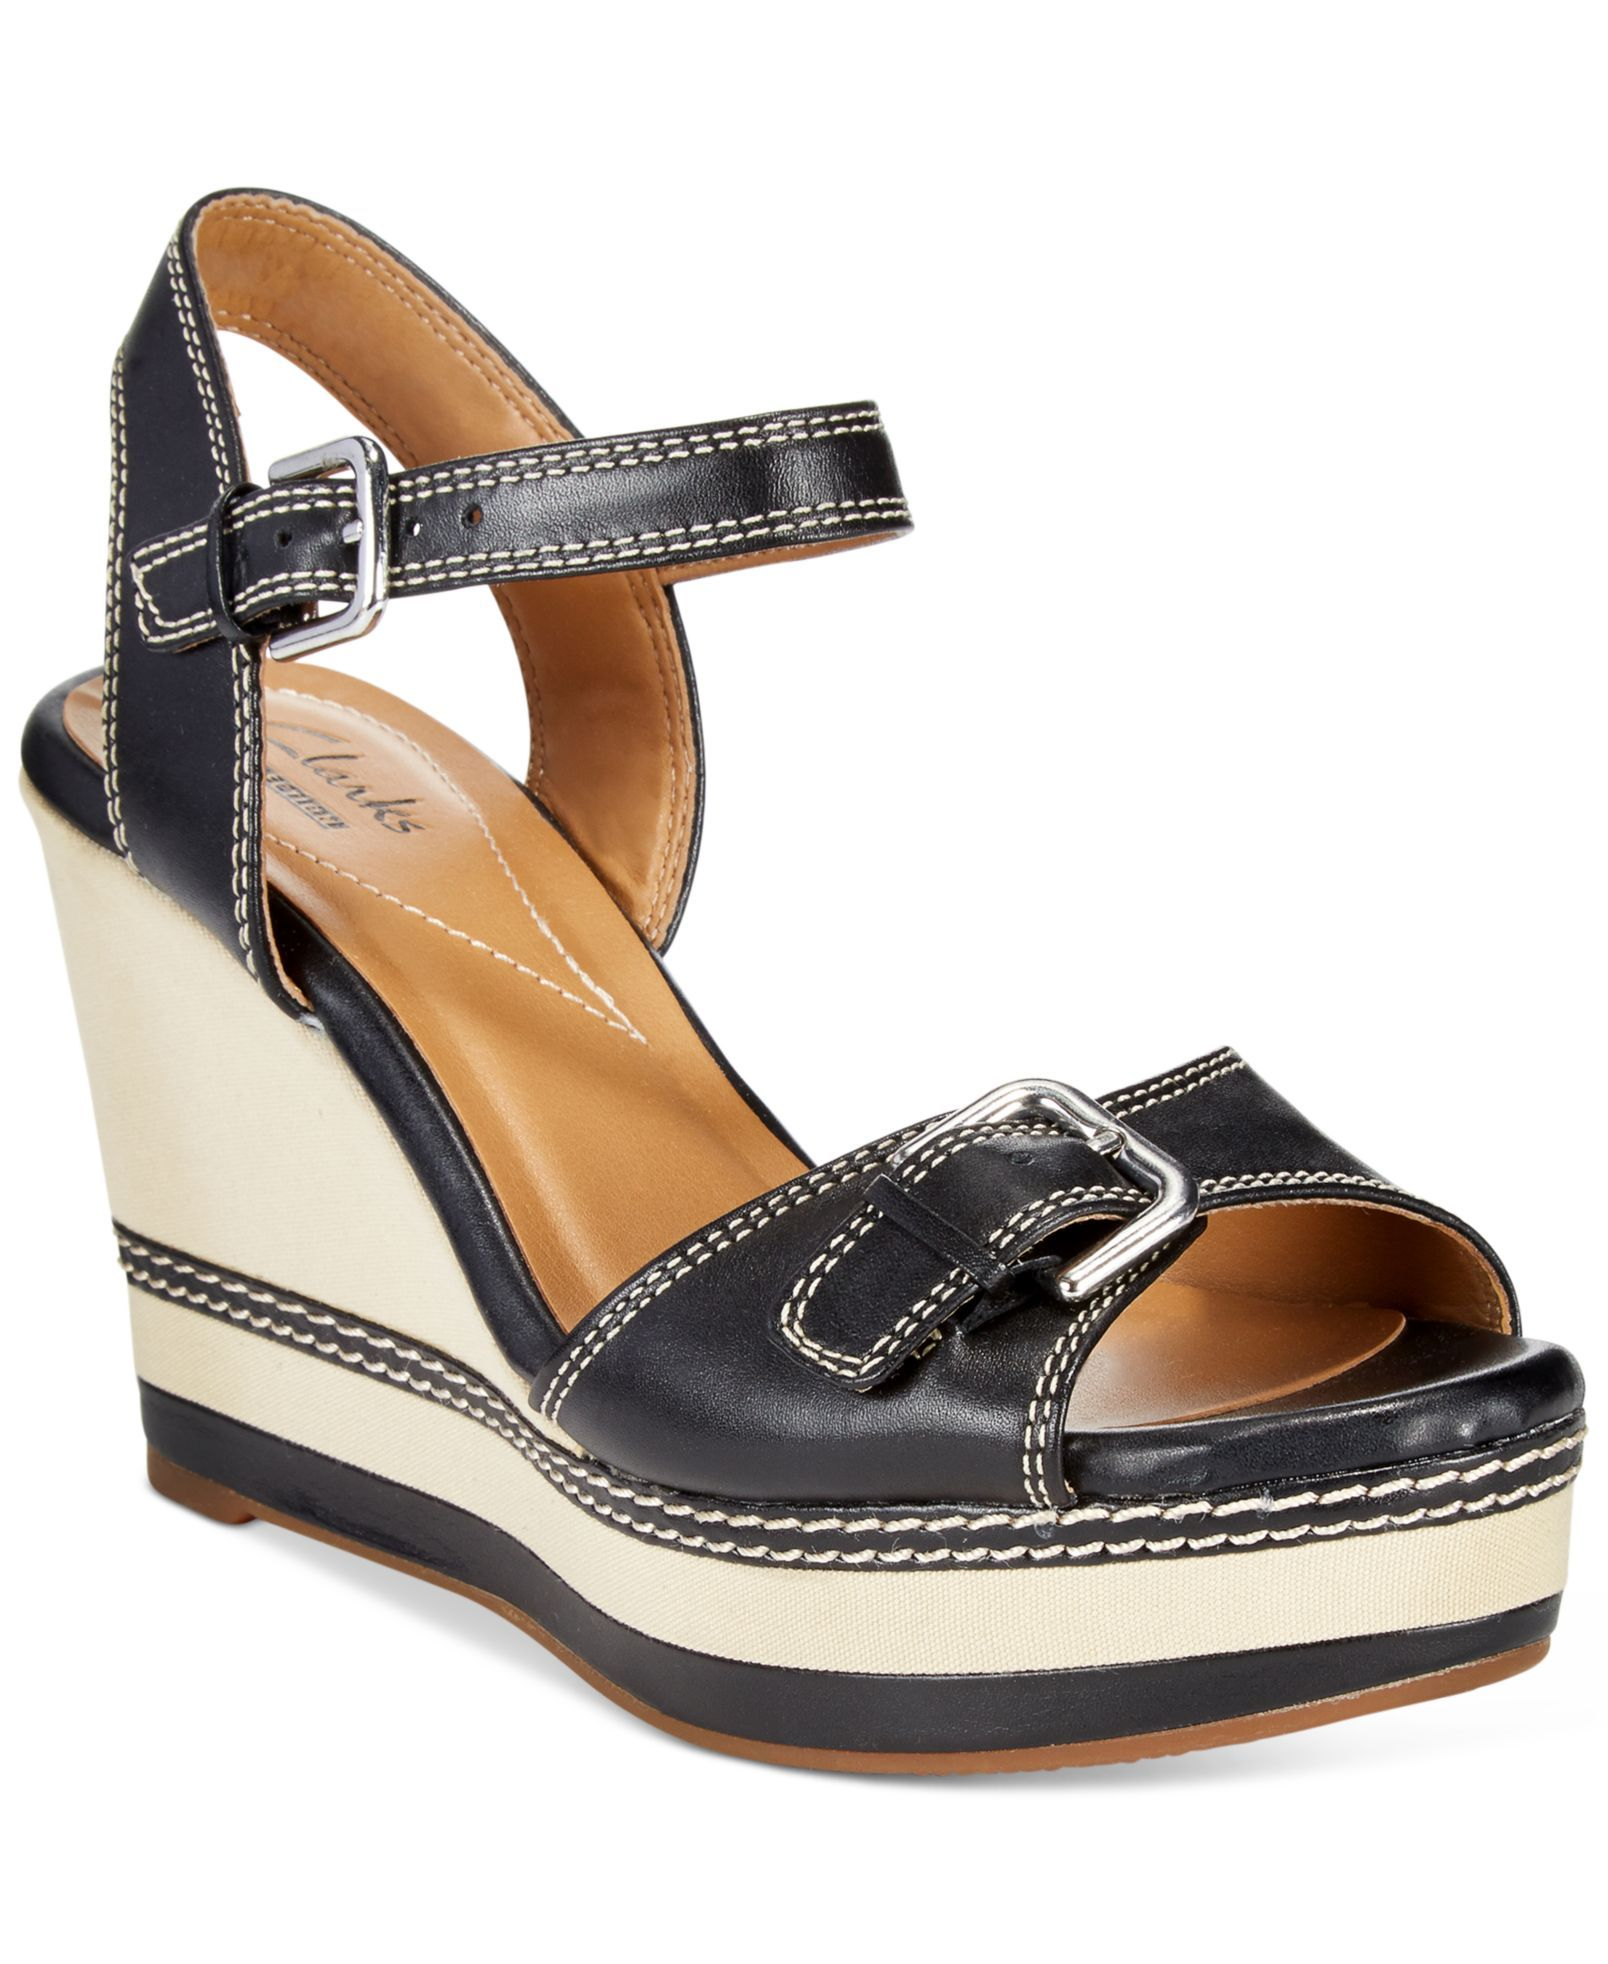 Clarks Collection Women's Zia Castle Wedge Sandals